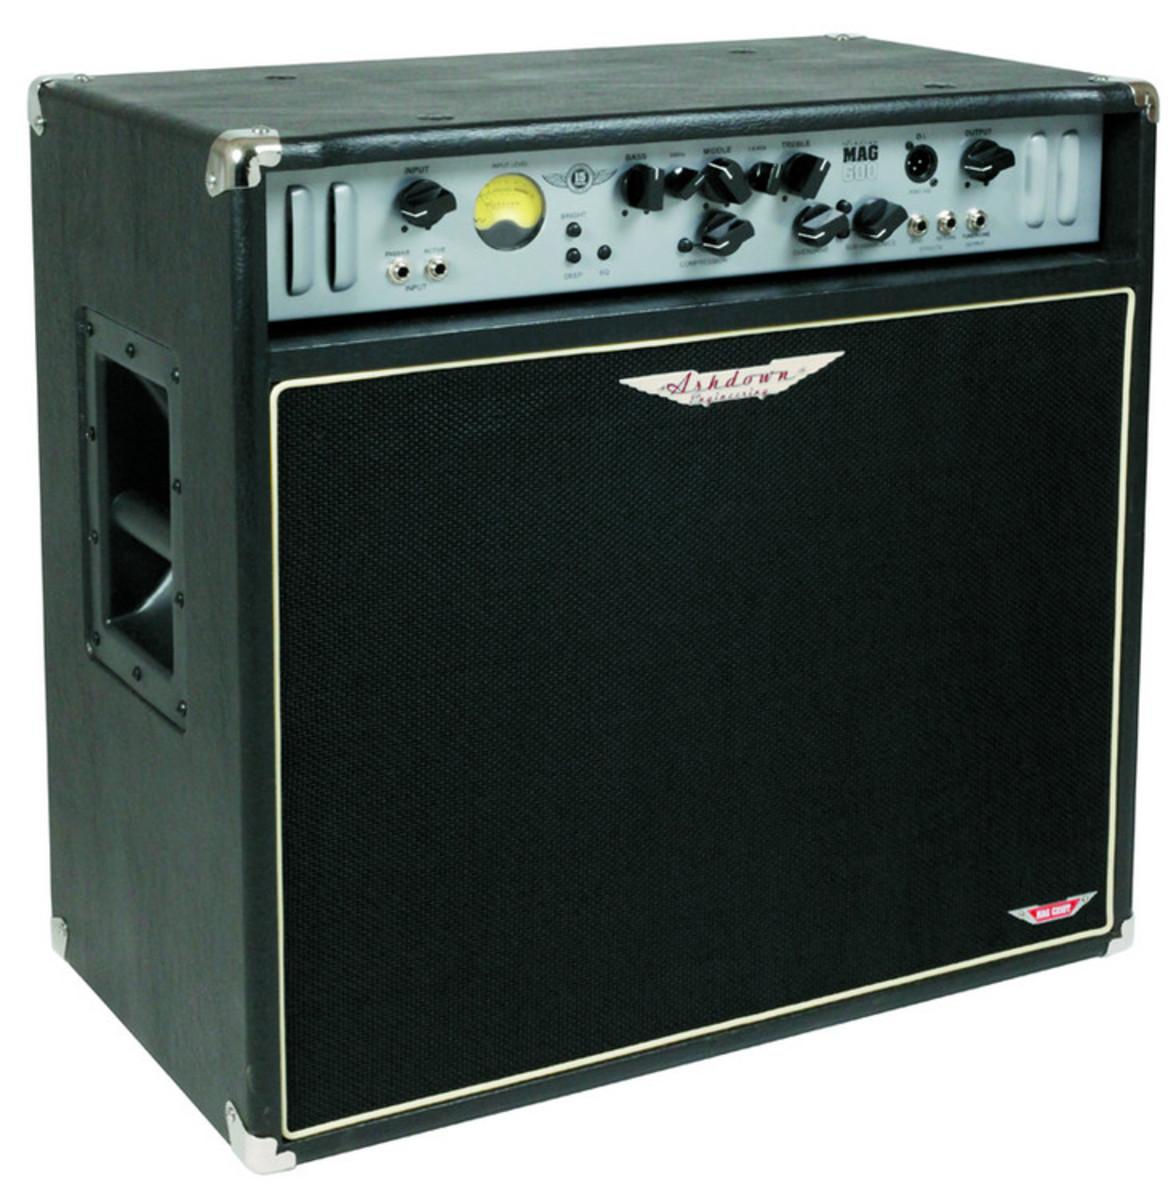 Ashdown Mag C210t 300 Evo Iii Bass Amp Combo Ex Demo At Gear4music Wiring Diagram Loading Zoom